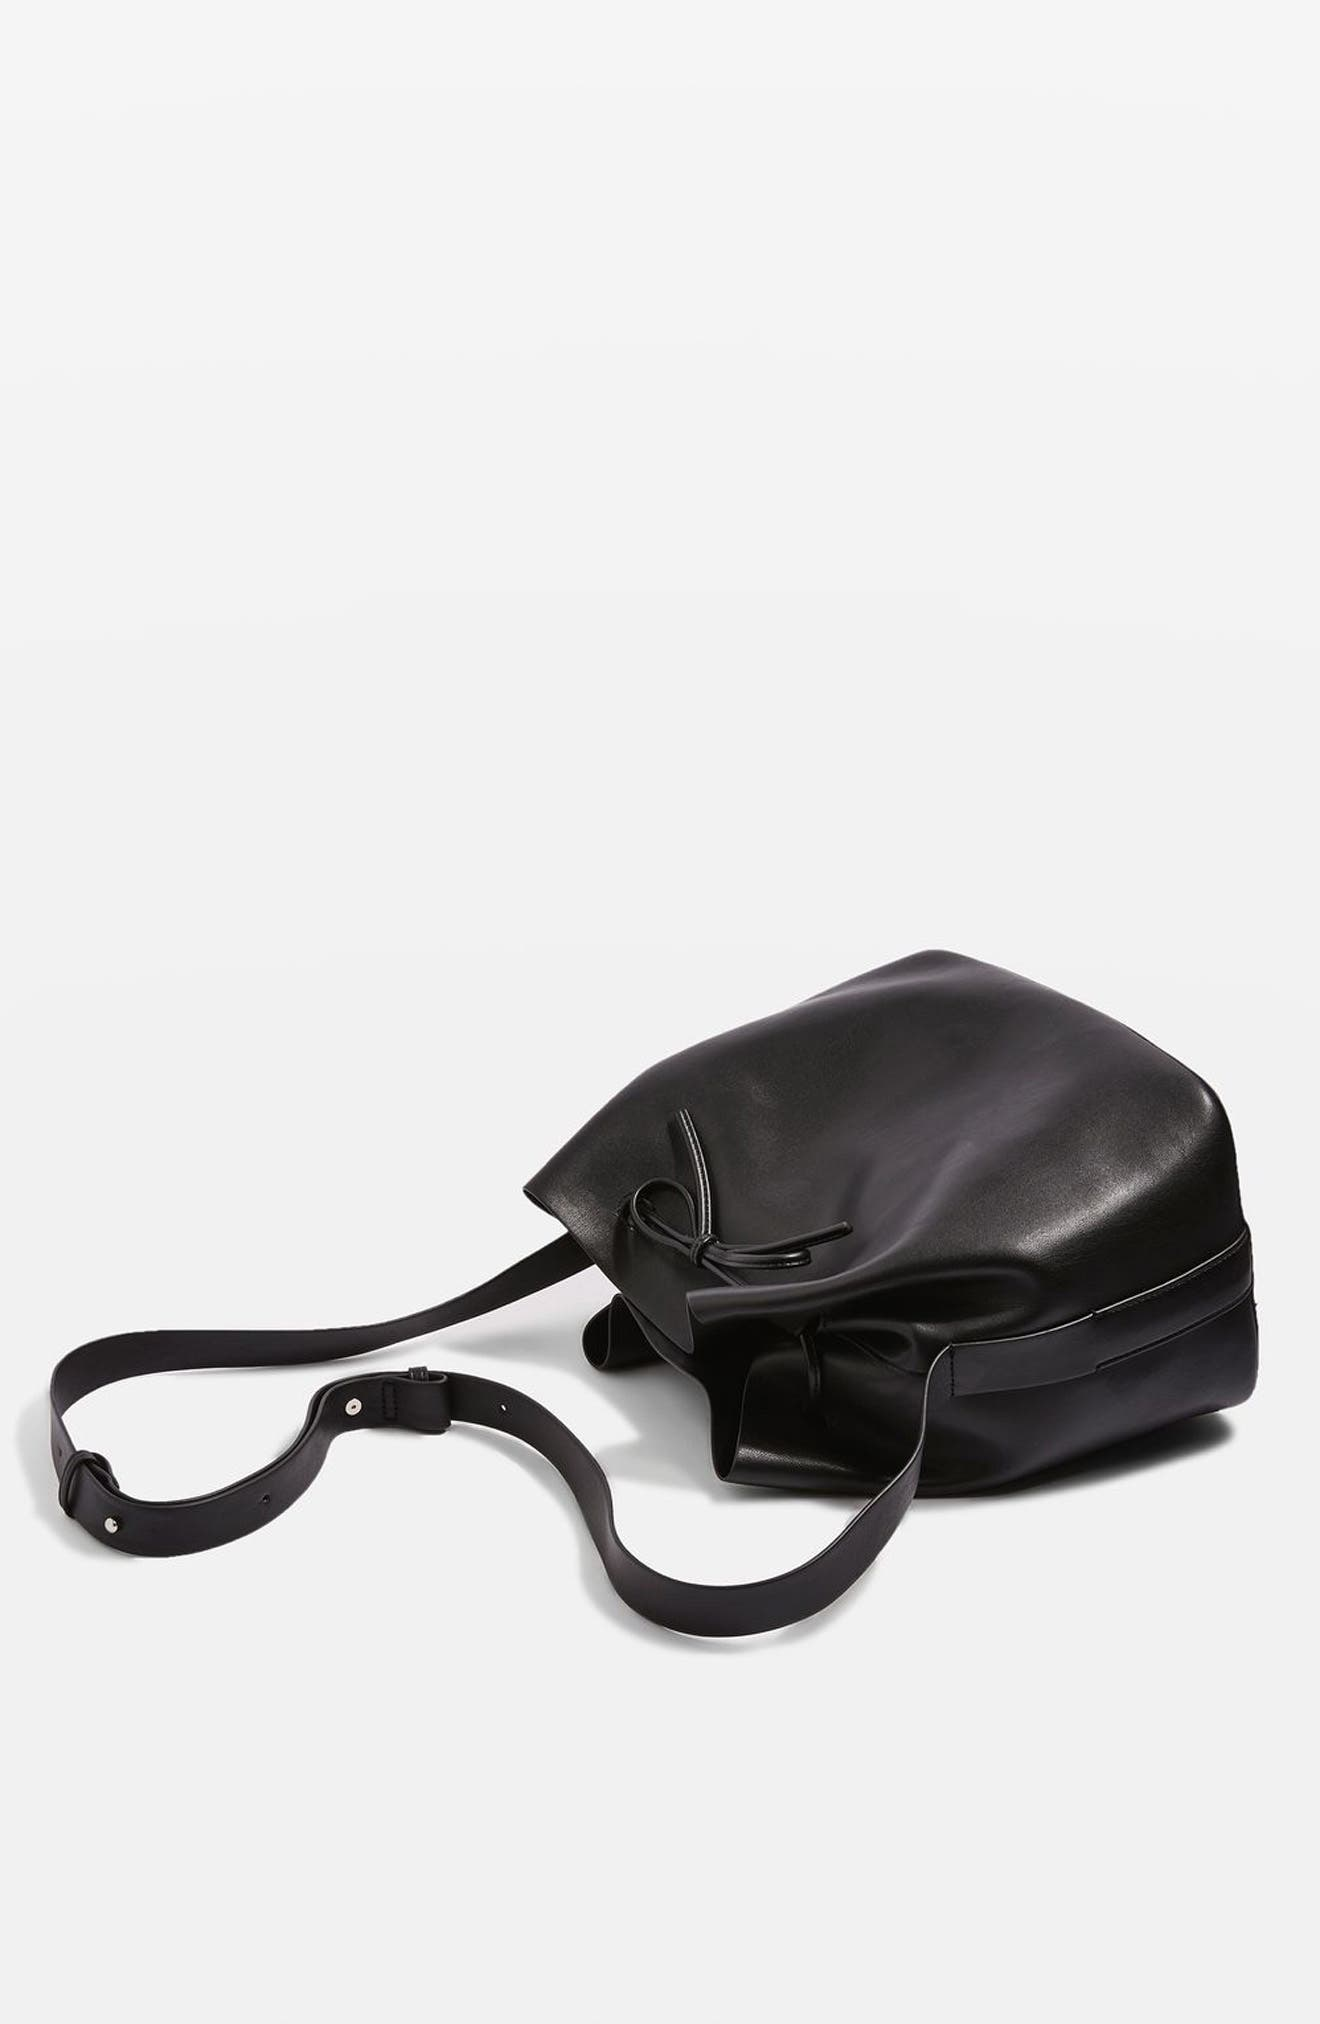 Stella Faux Leather Bucket Bag,                             Alternate thumbnail 10, color,                             001